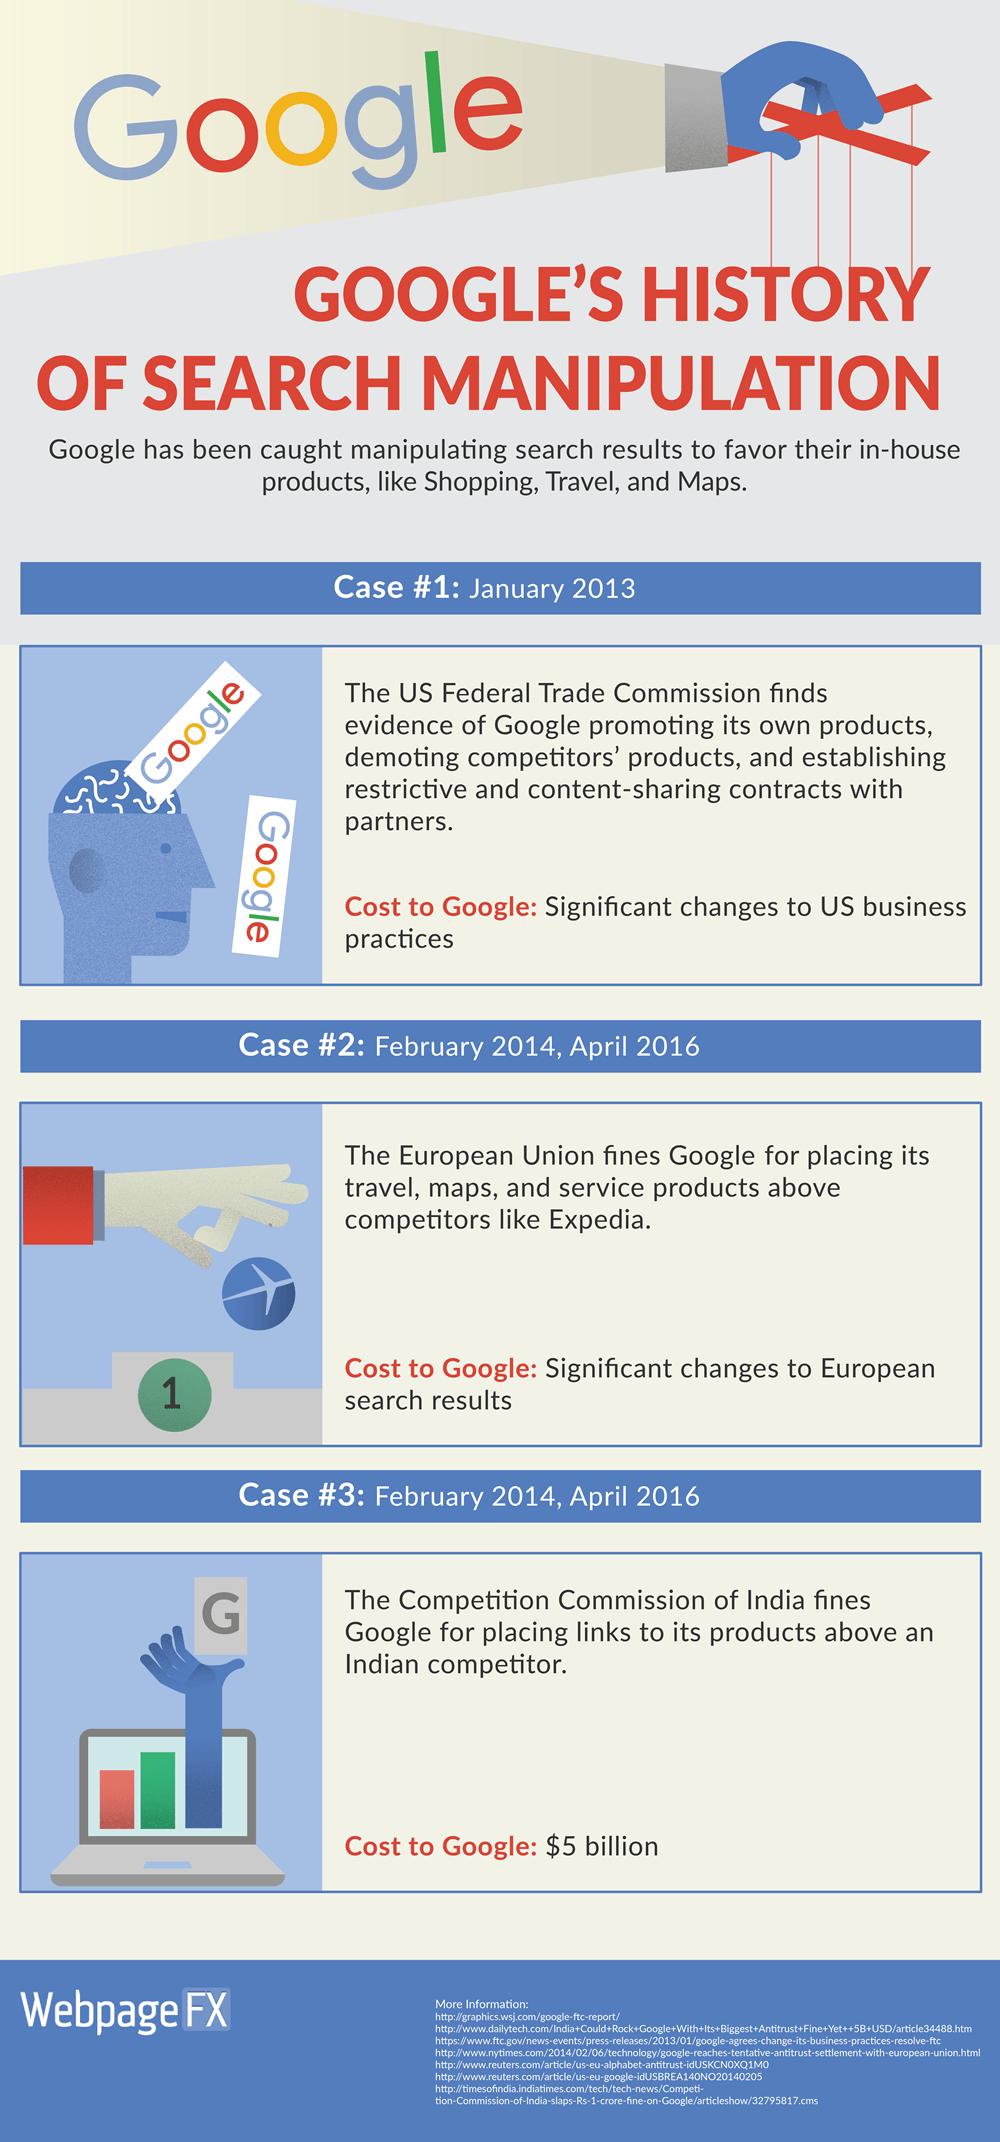 googles-history-search-manipulation